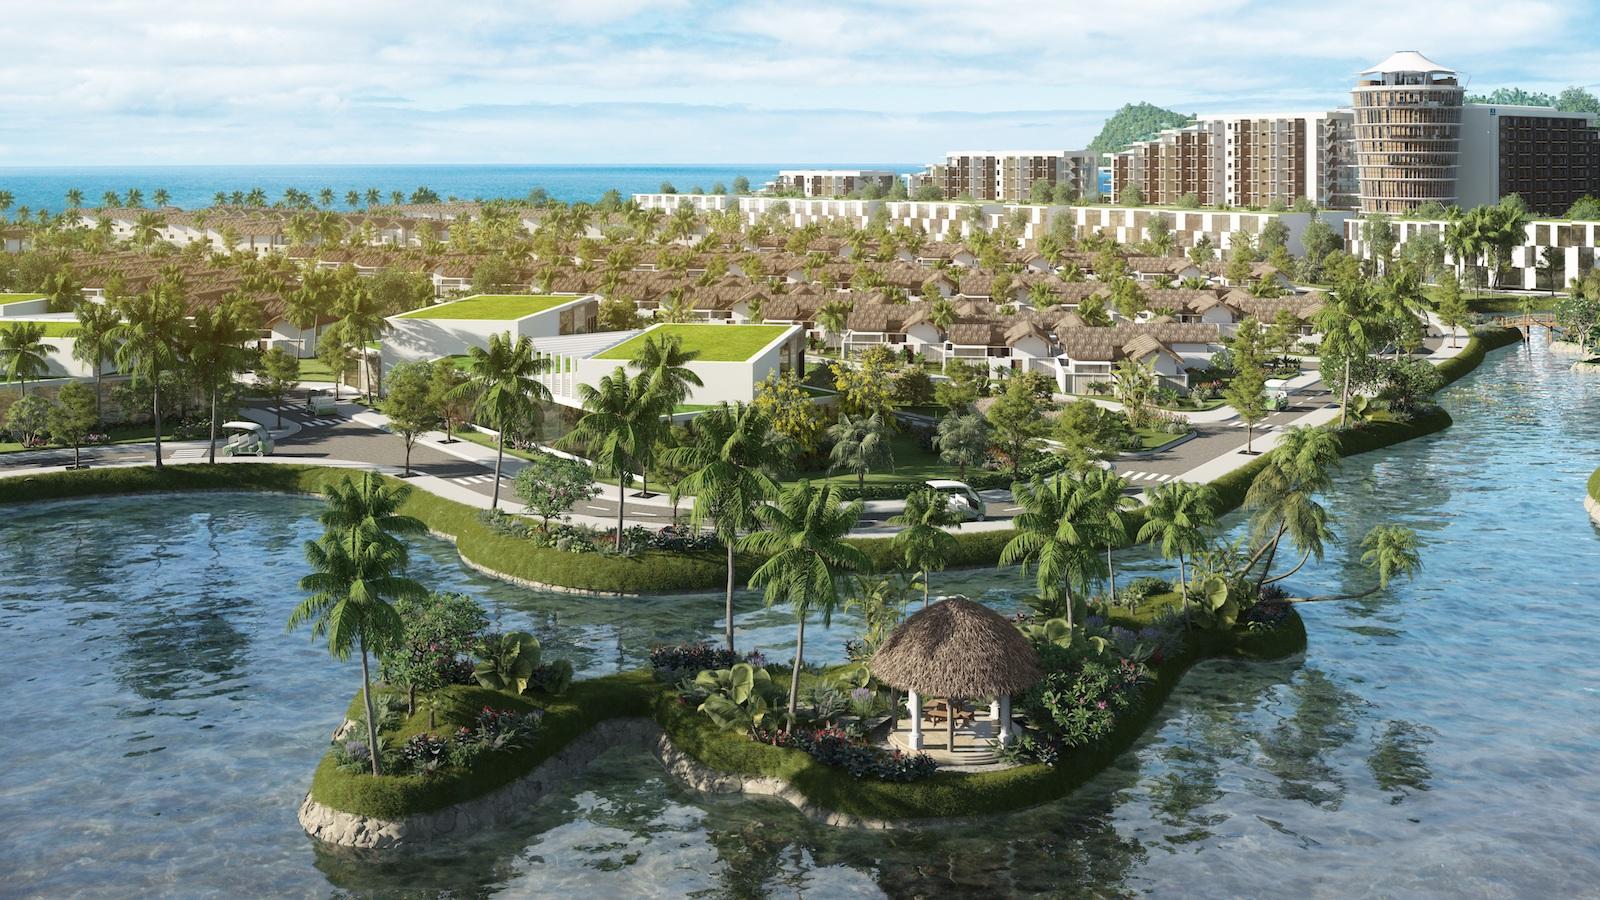 Biệt thự Sun Premier Village Resort